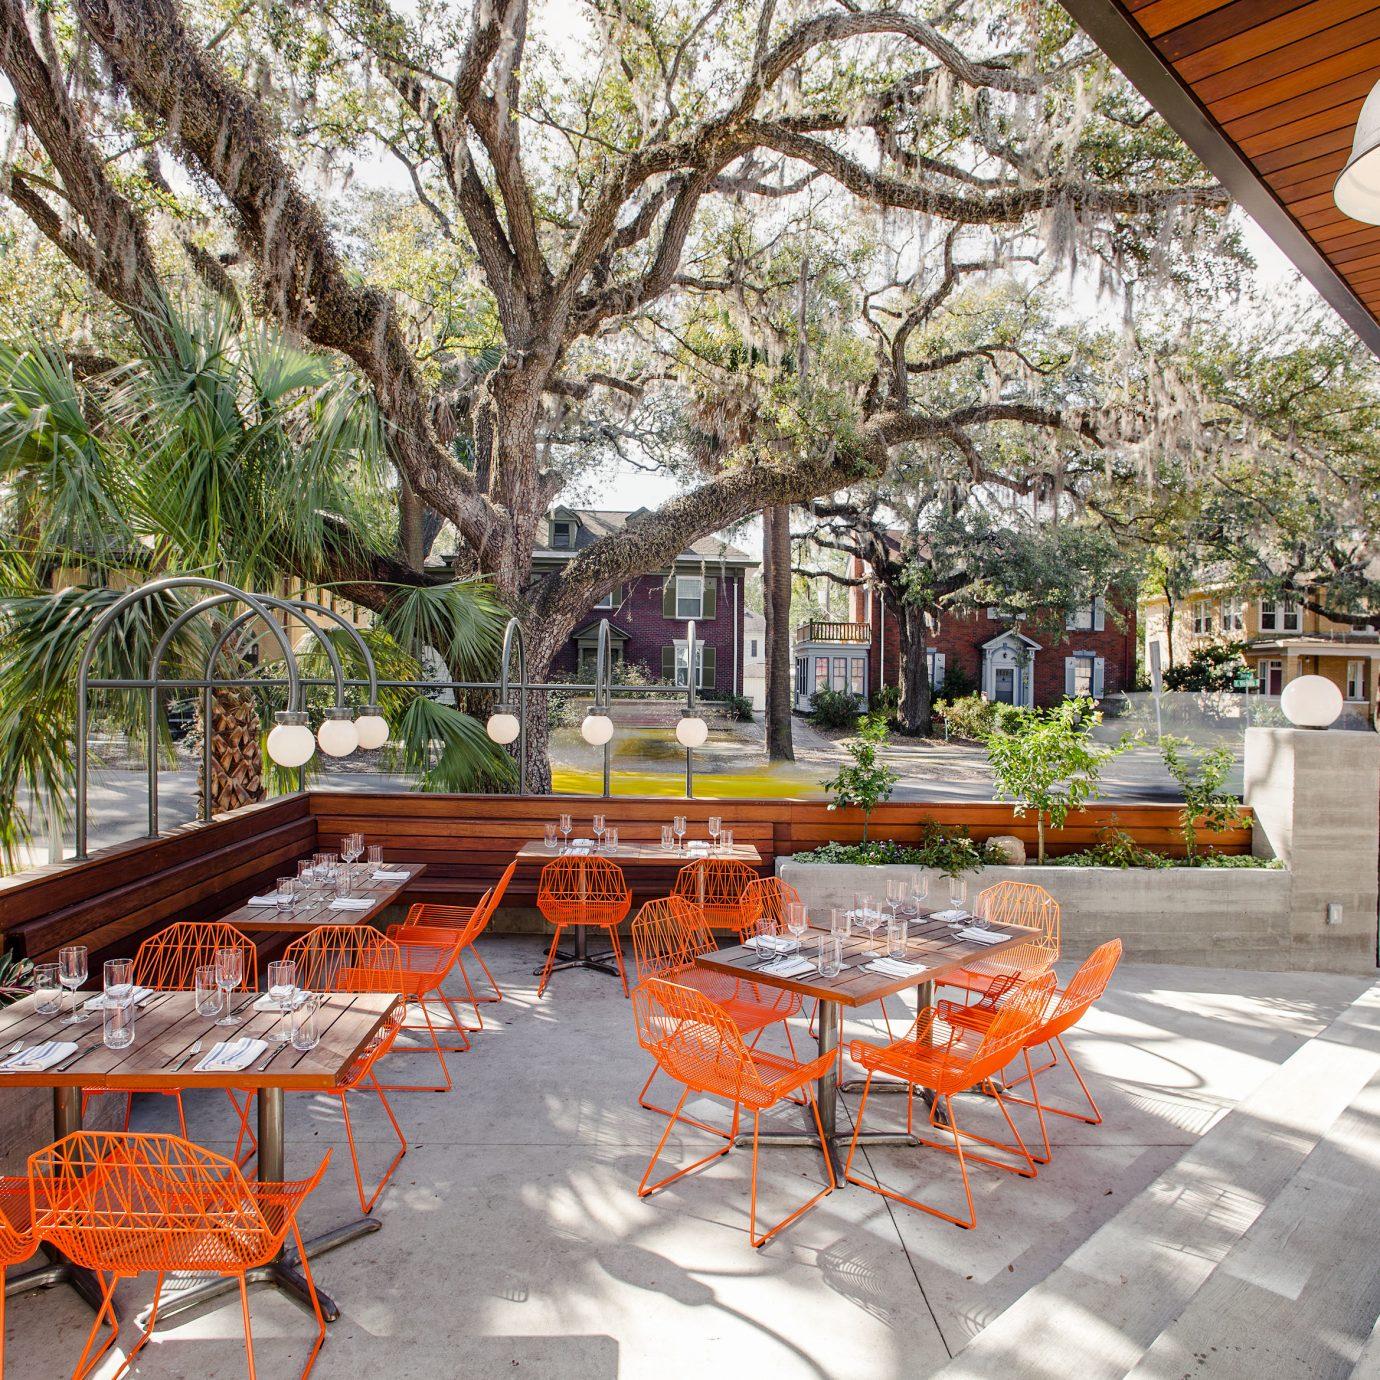 Girls Getaways Trip Ideas Weekend Getaways tree plant table outdoor structure real estate Courtyard mixed use Resort Patio urban design leisure